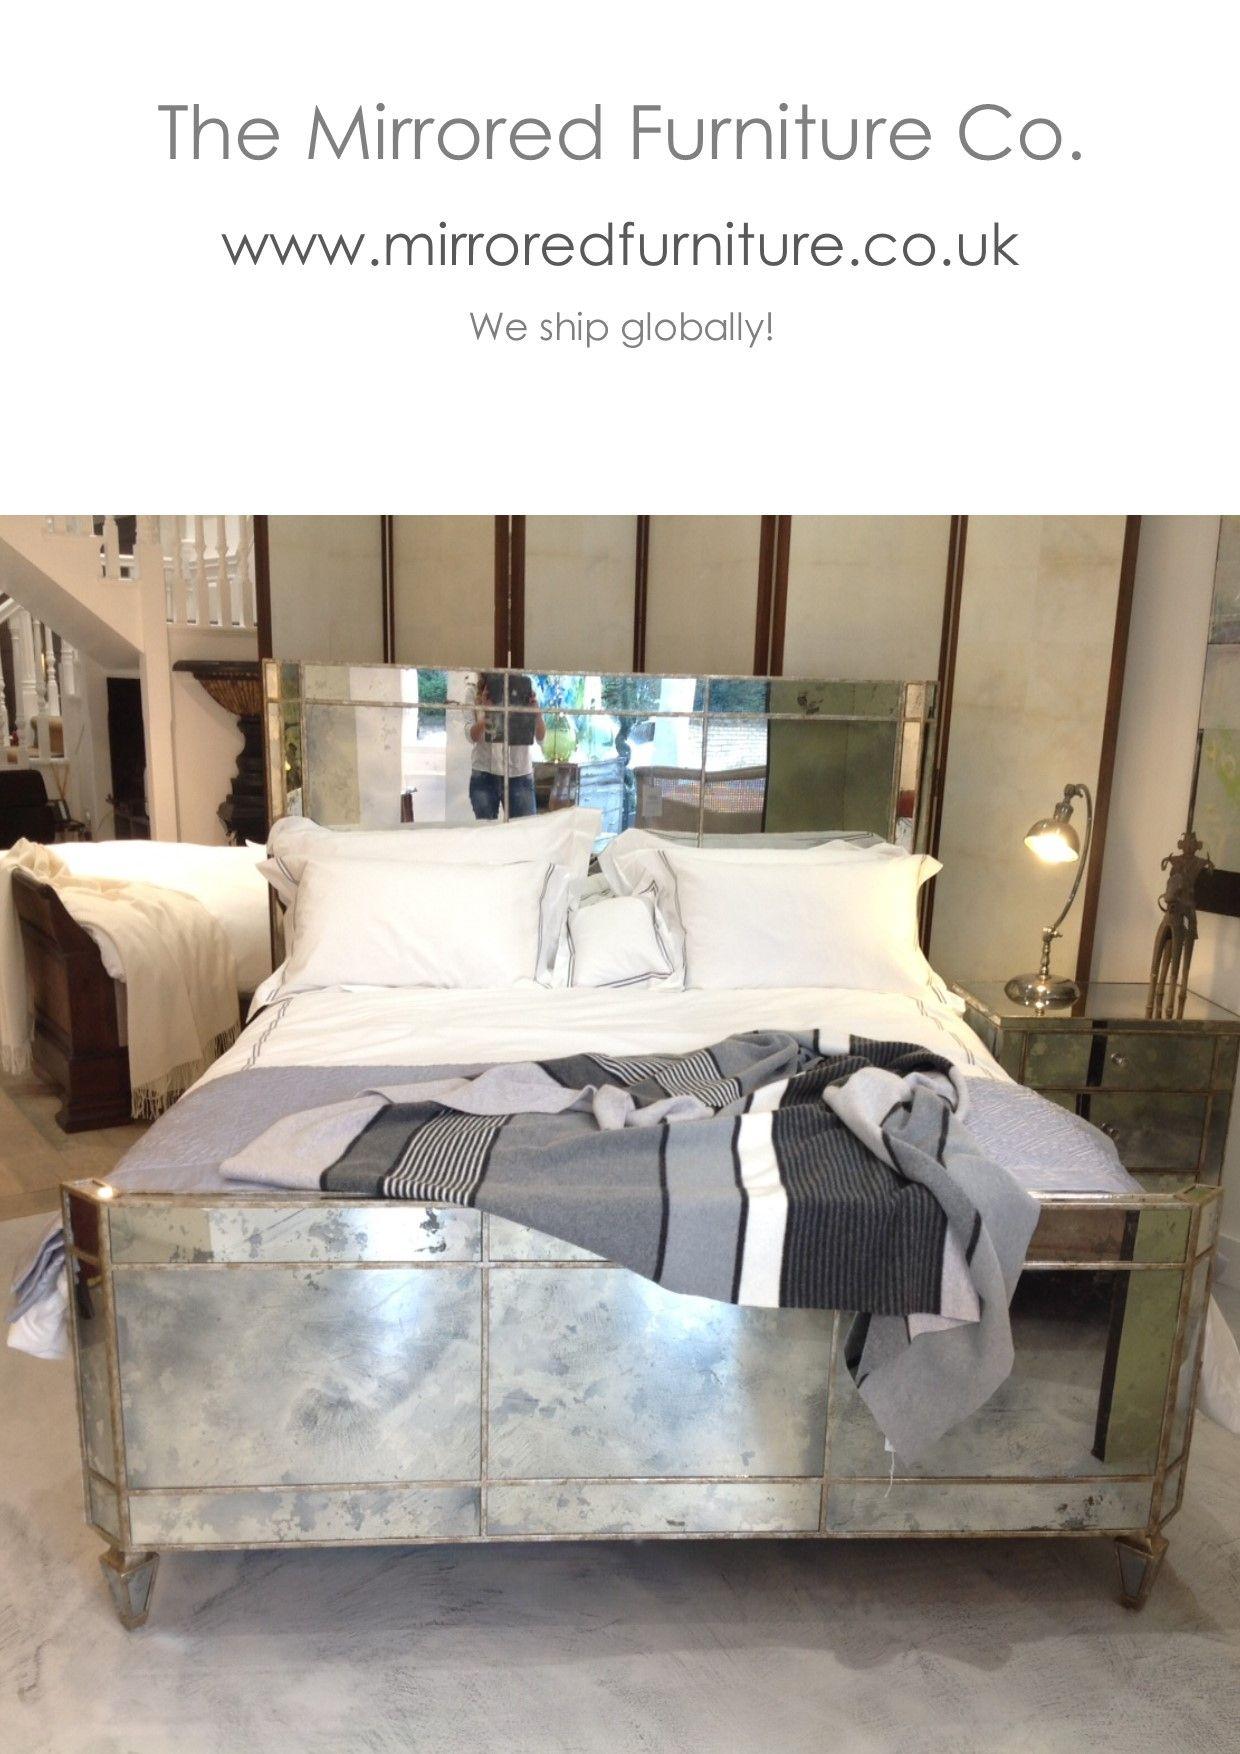 Valentina Mirrored Bed Handmade To Order King Size 5950 00 Gpb Super King 6950 00 Gbp Www Mirroredfurniture C Furniture Mirrored Furniture Nightstand Decor